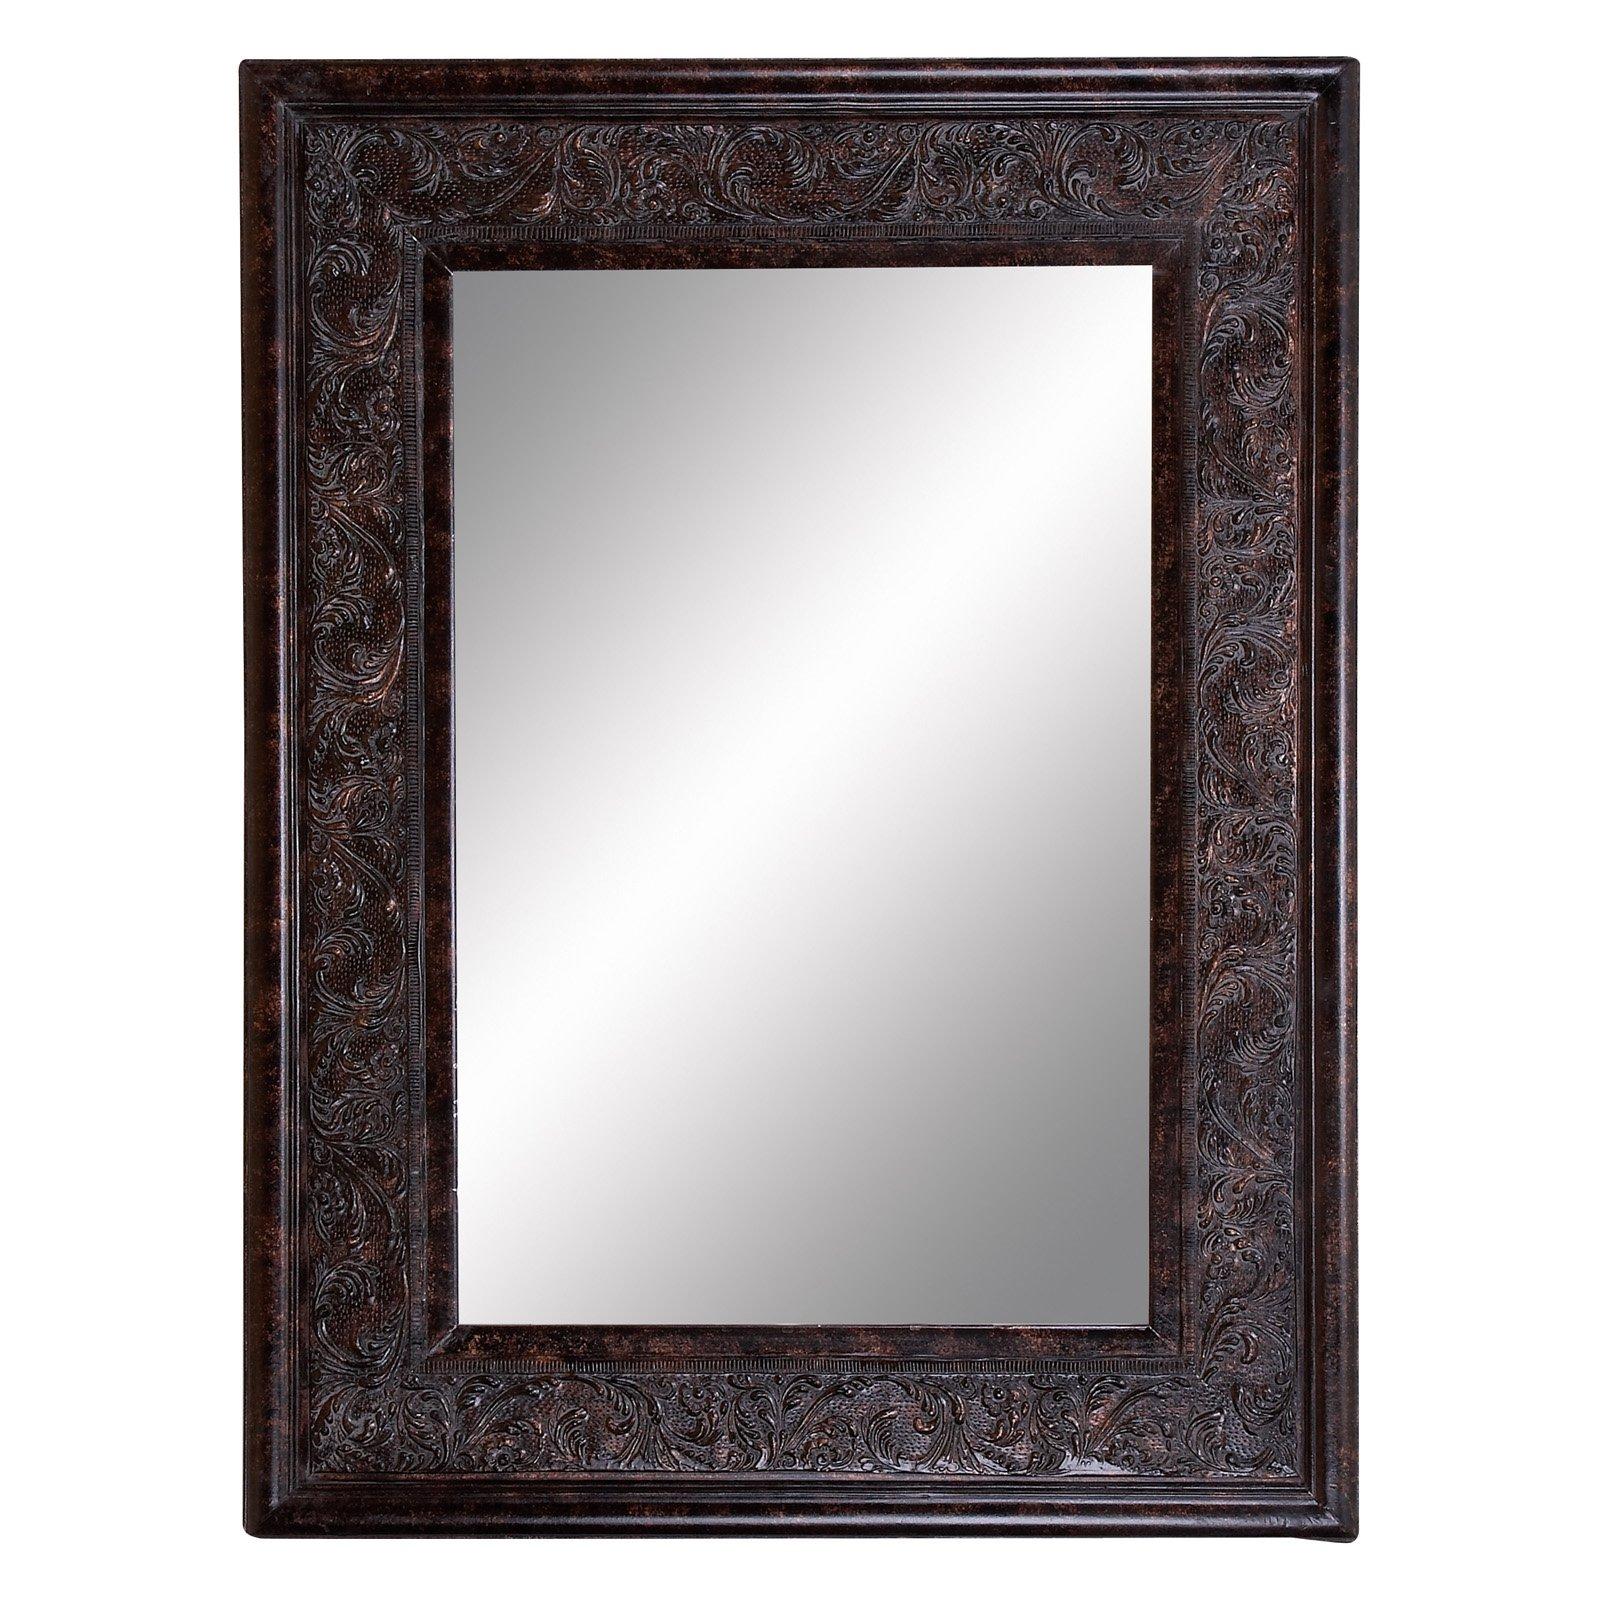 Decmode Wood Bevelled Mirror, Brown